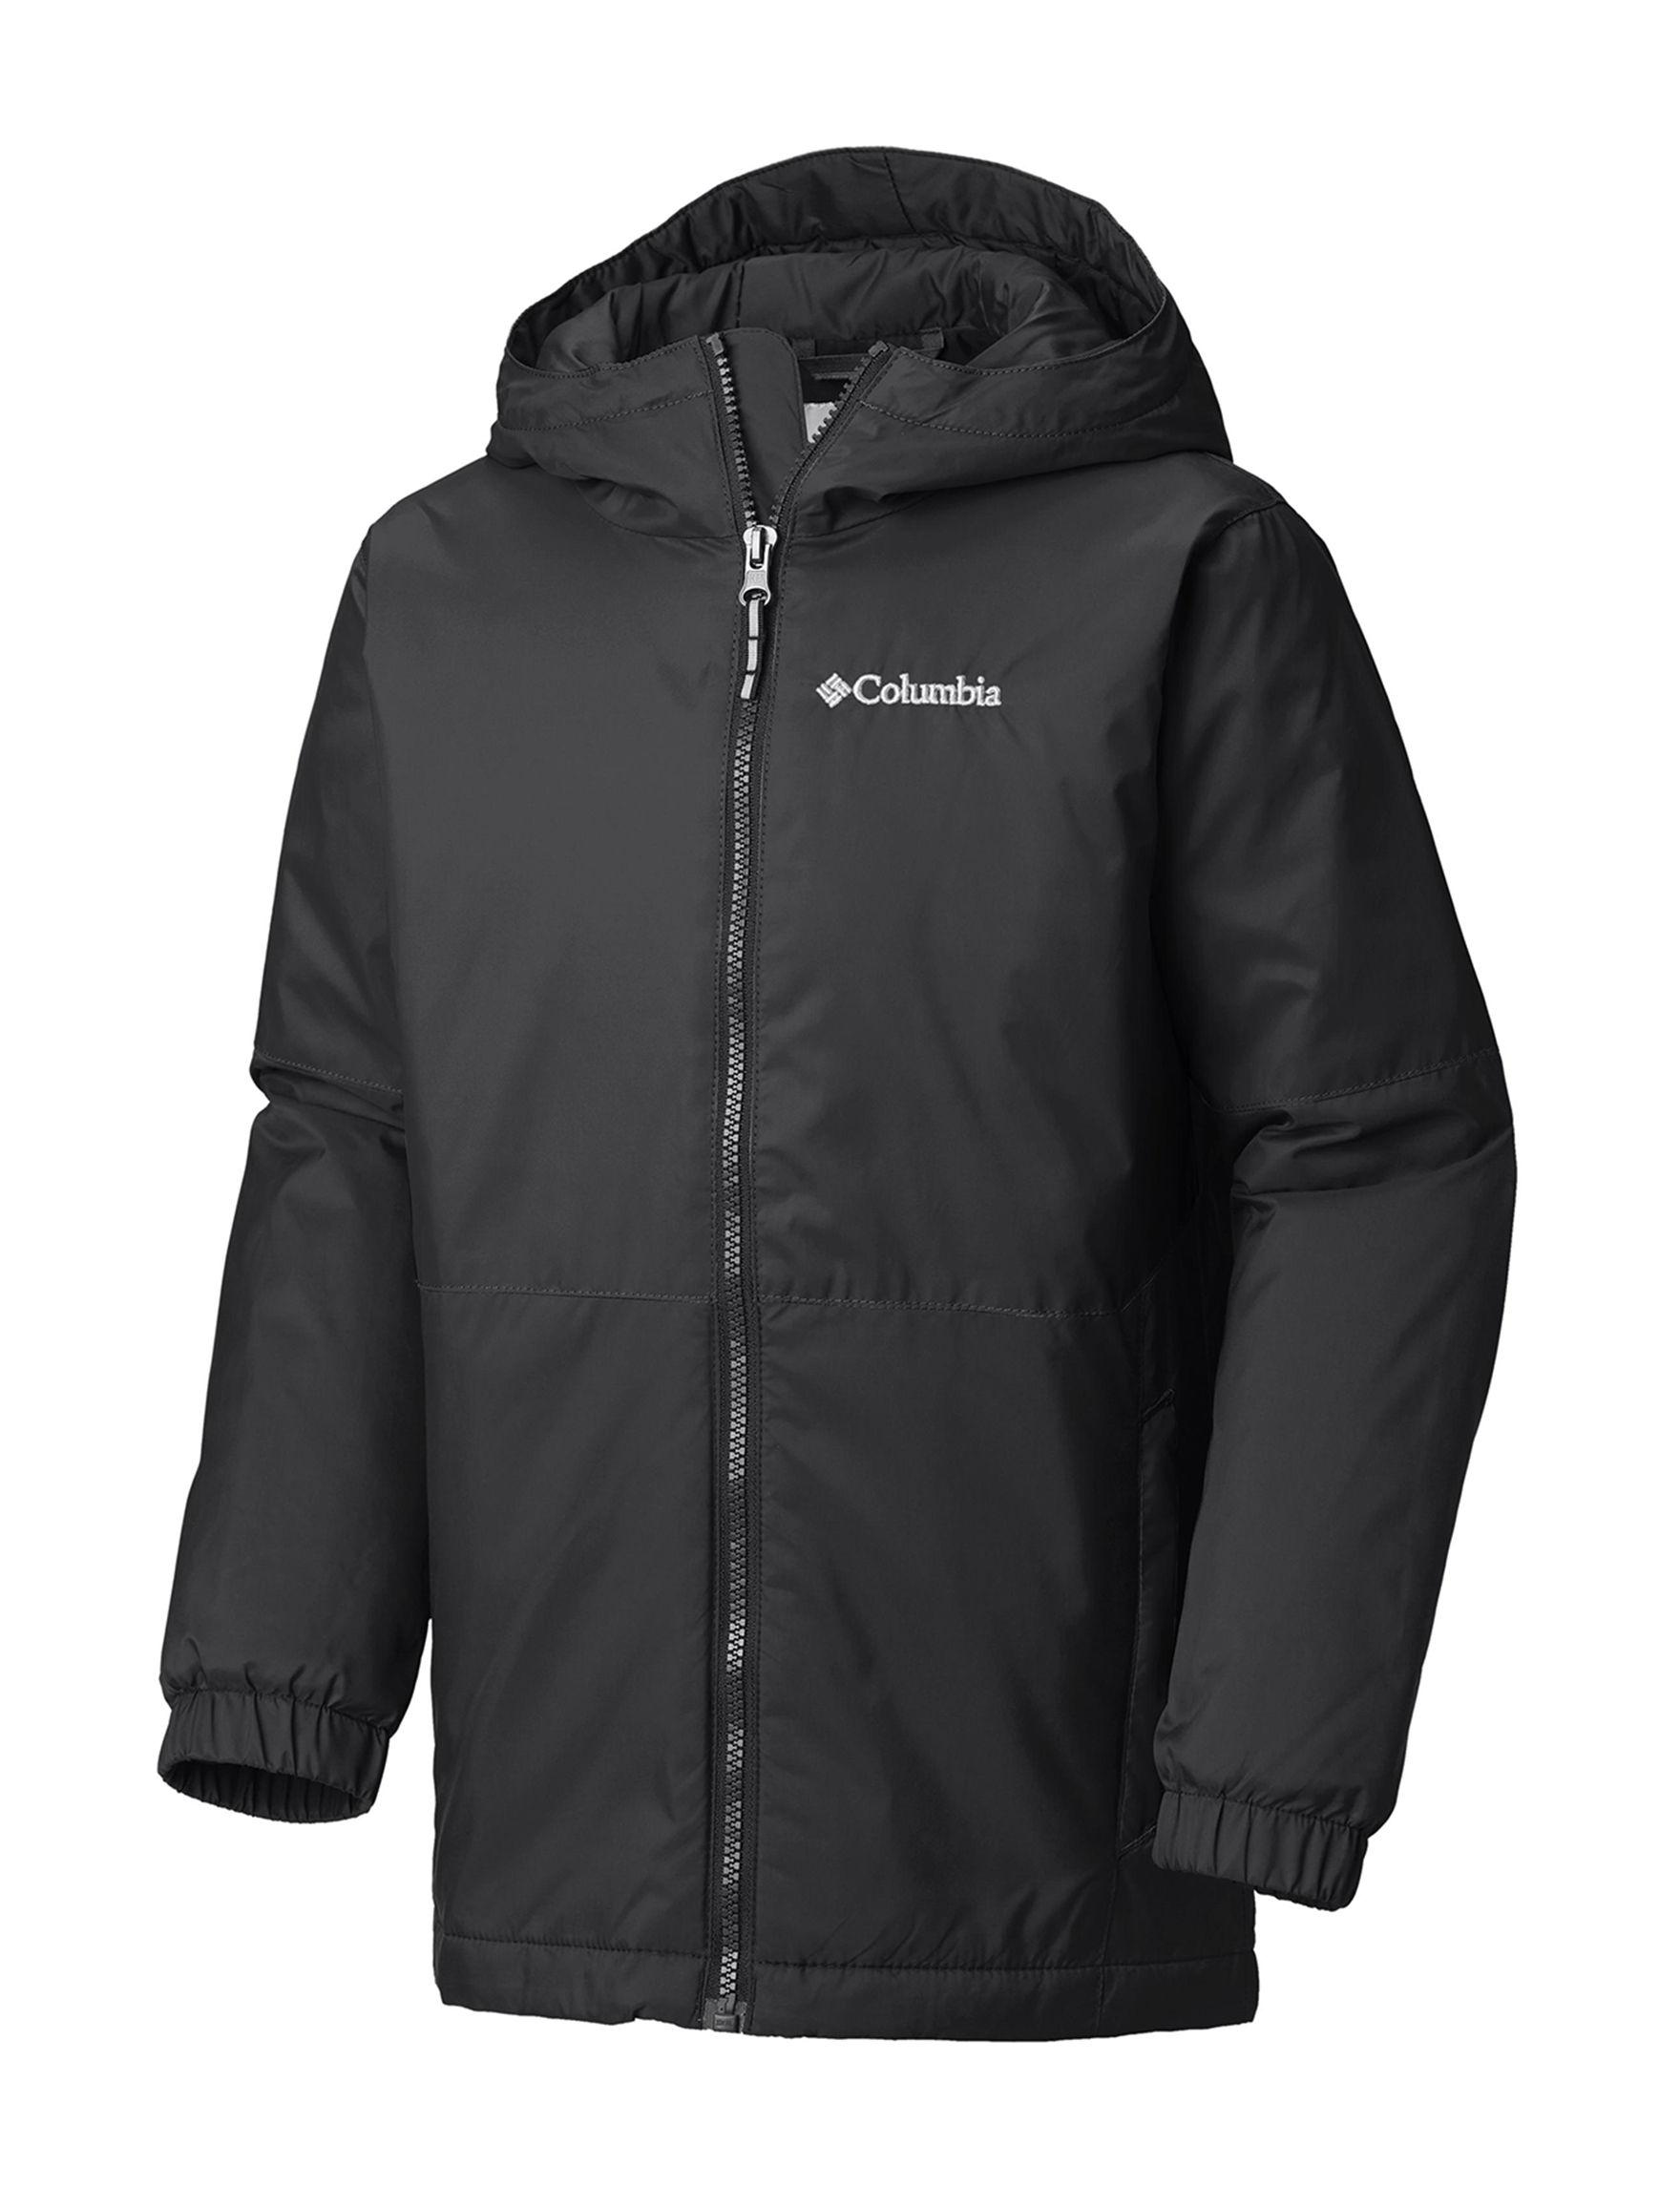 Columbia Dark Grey Fleece & Soft Shell Jackets